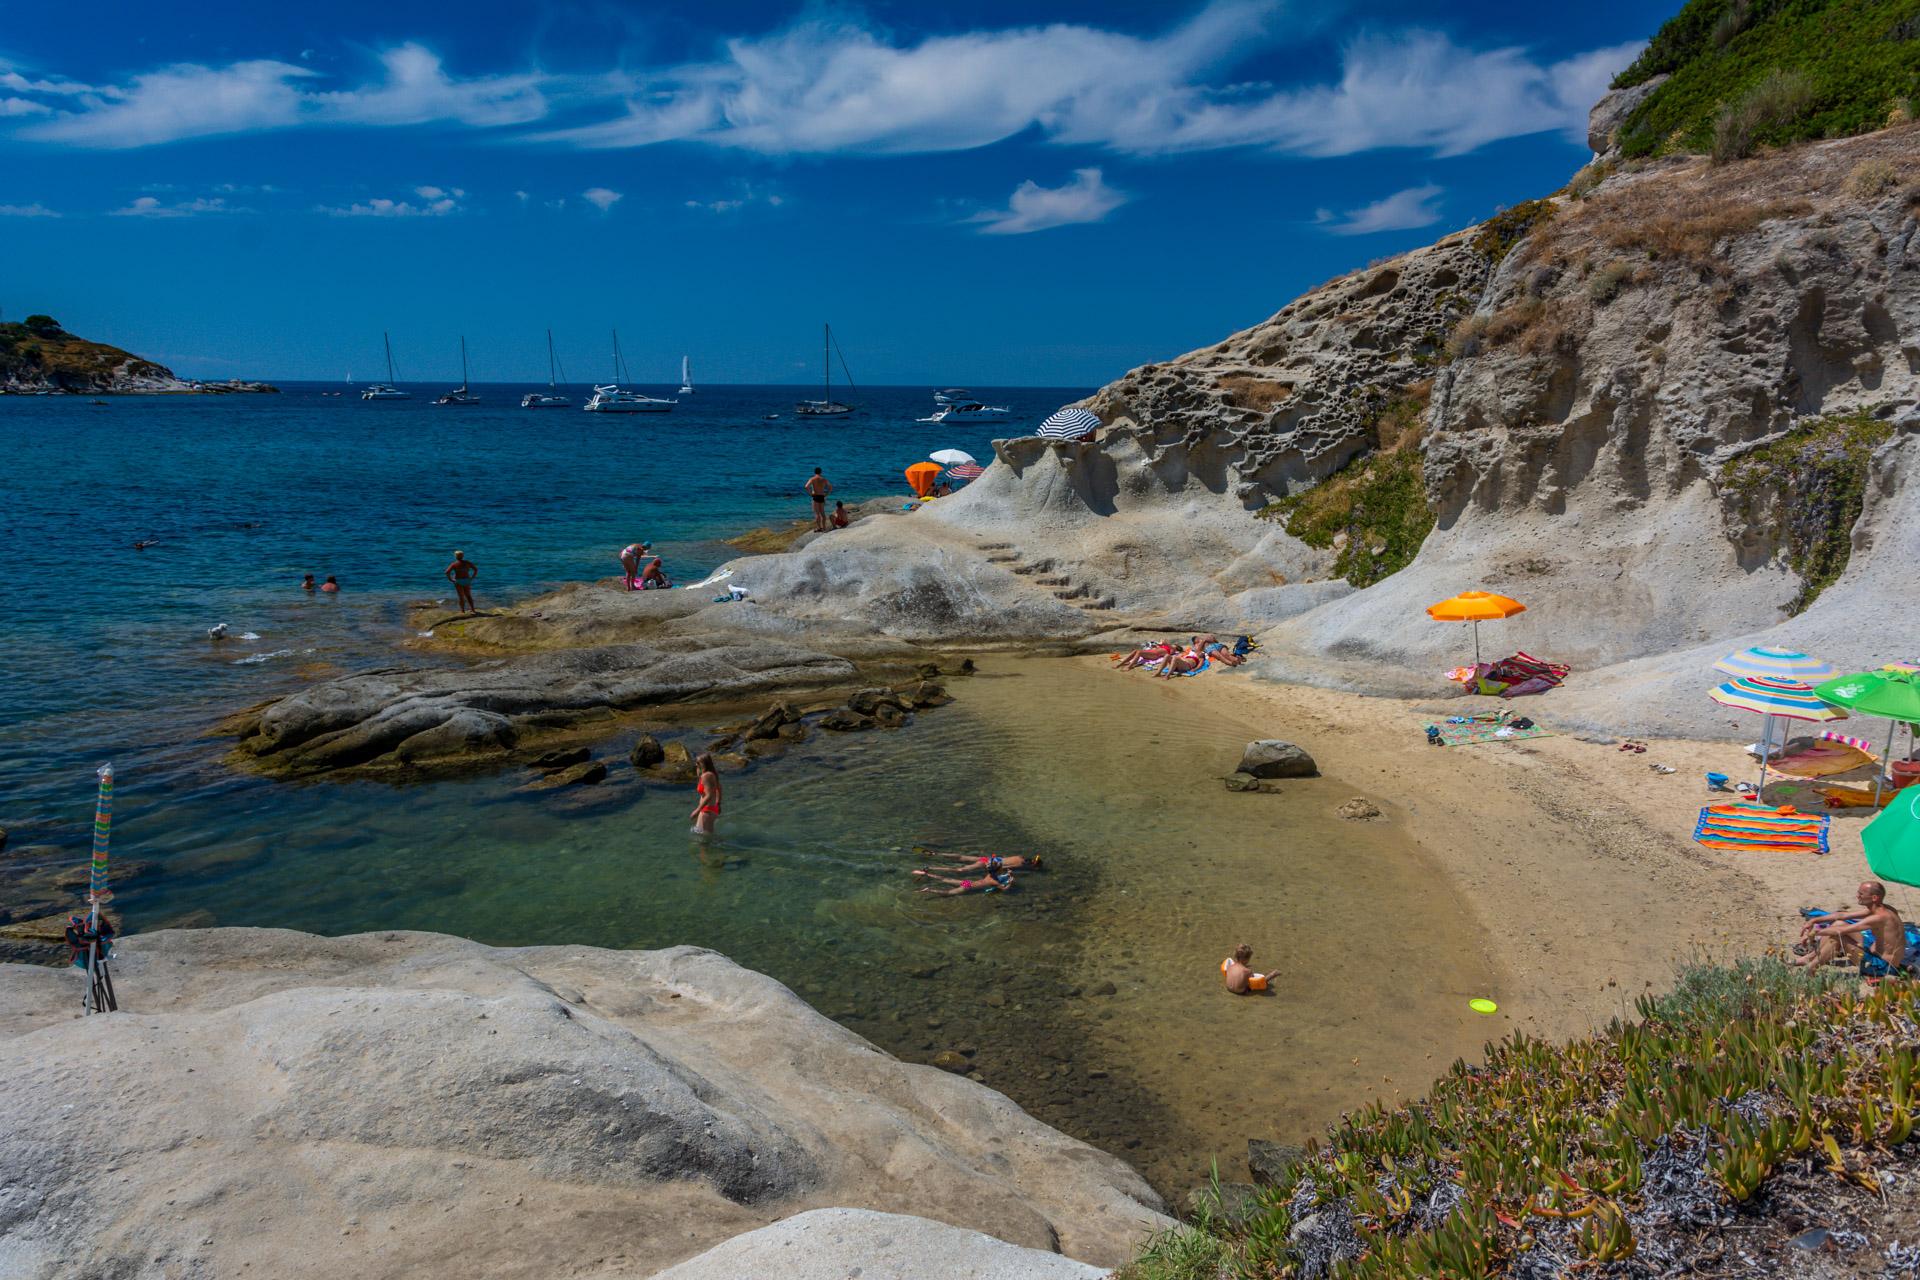 Insel Elba Karte.Highlights Und Sehenswürdigkeiten Der Insel Elba Insel Elba Der